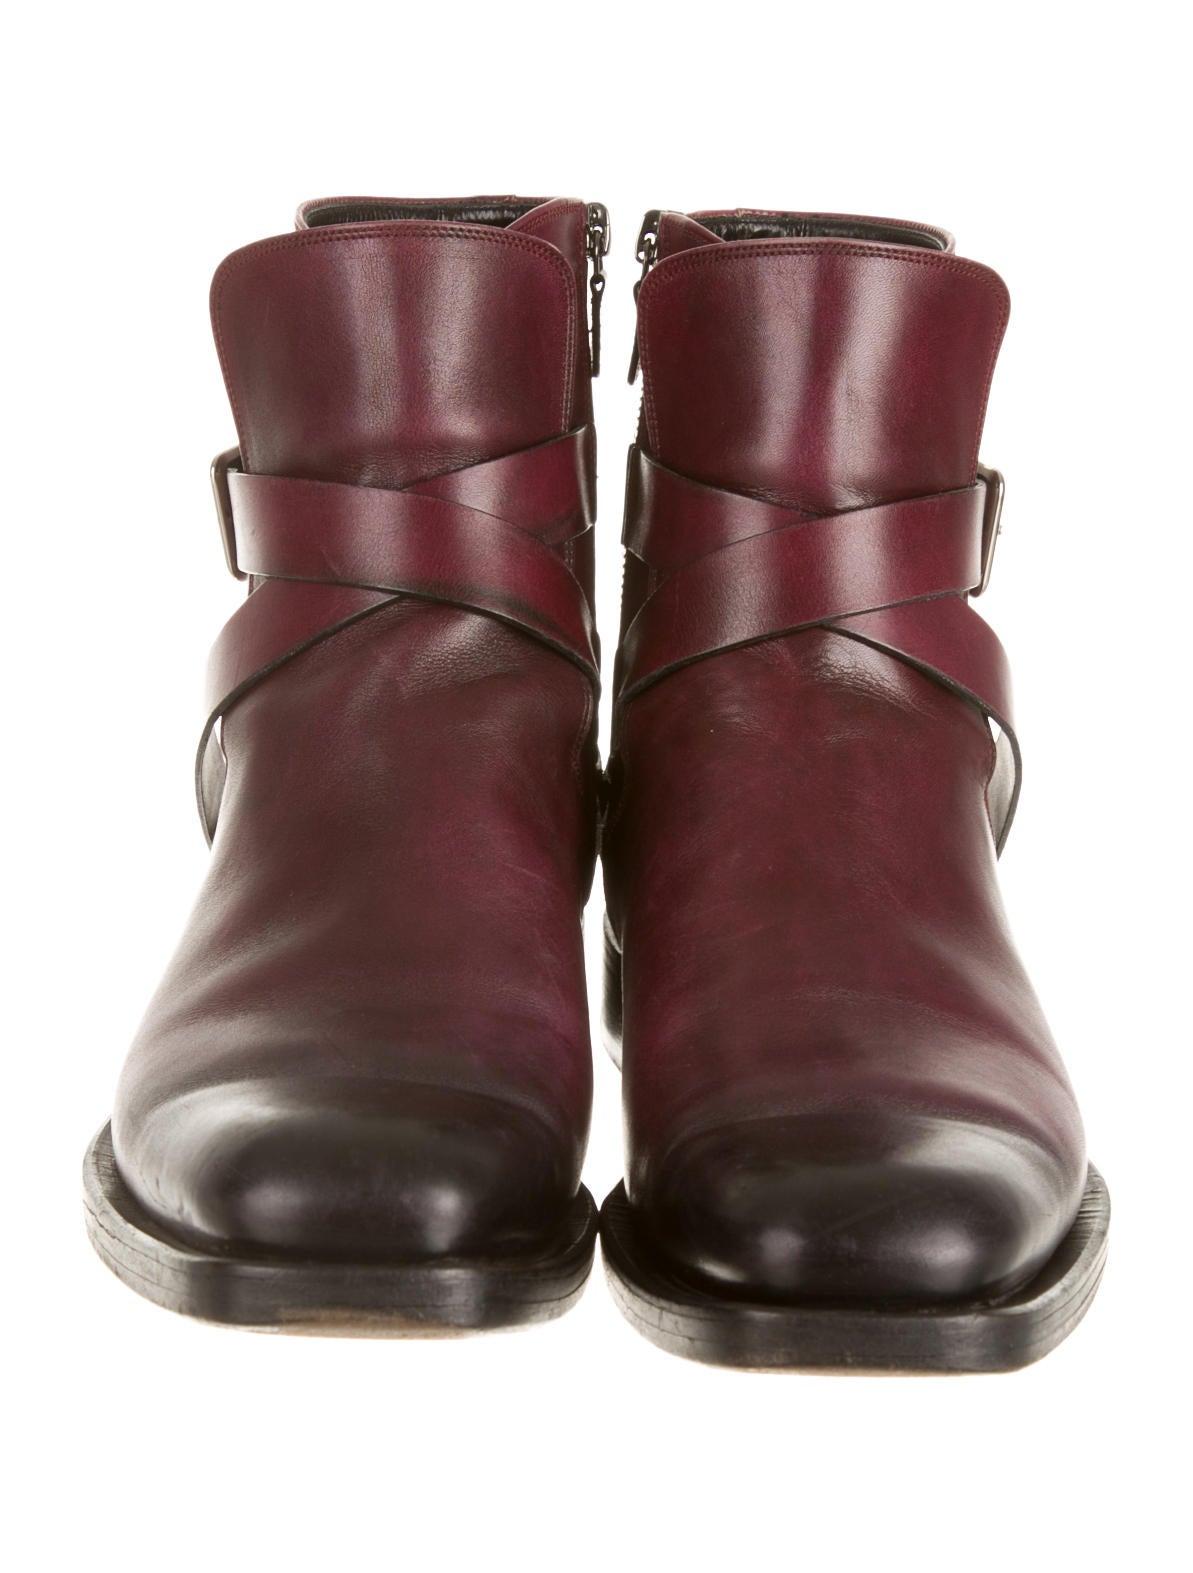 salvatore ferragamo boots shoes sal21806 the realreal